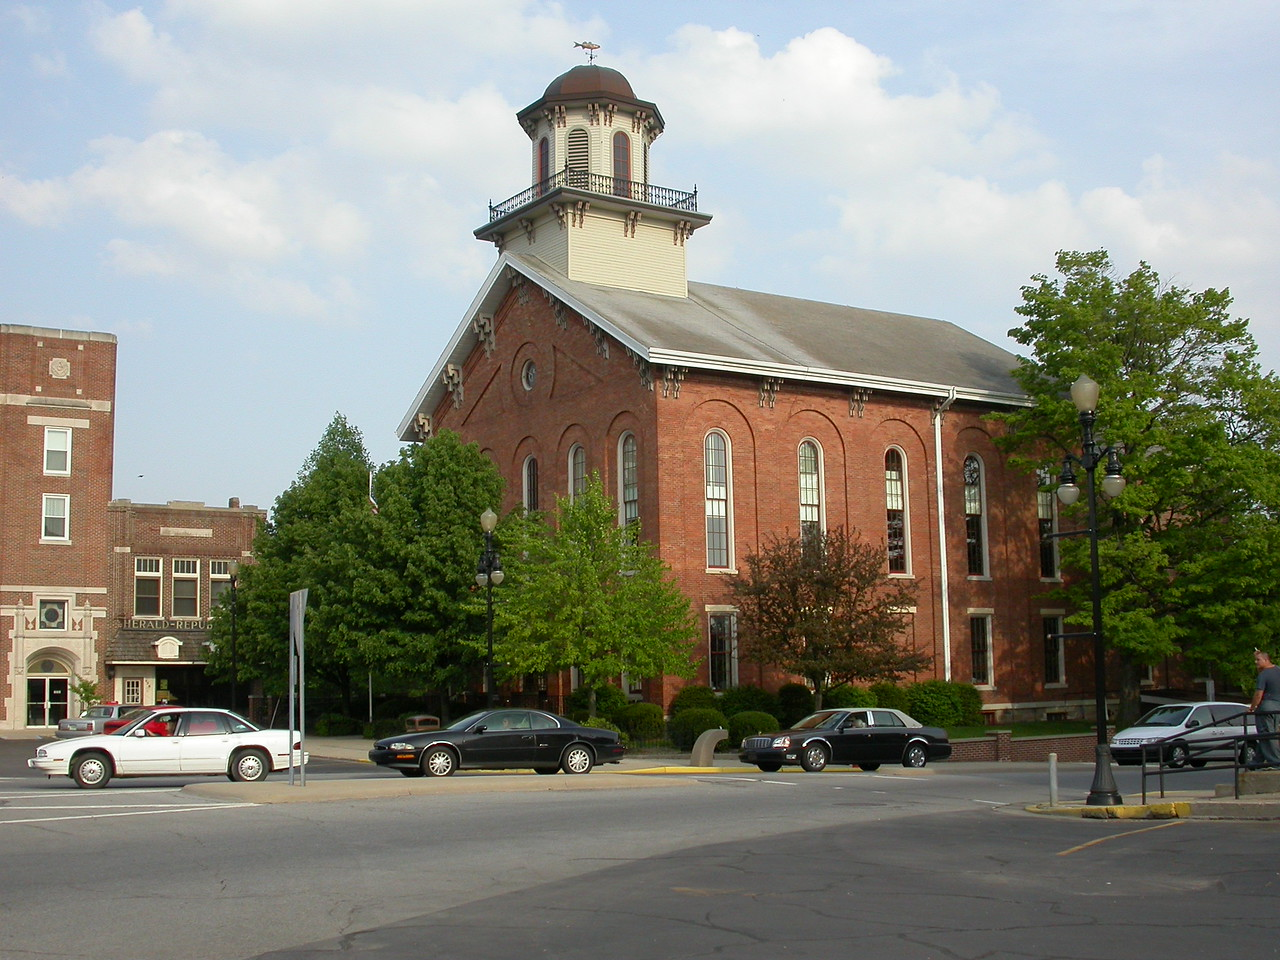 Steuben County Courthouse, Angola, Indiana, May 2004.